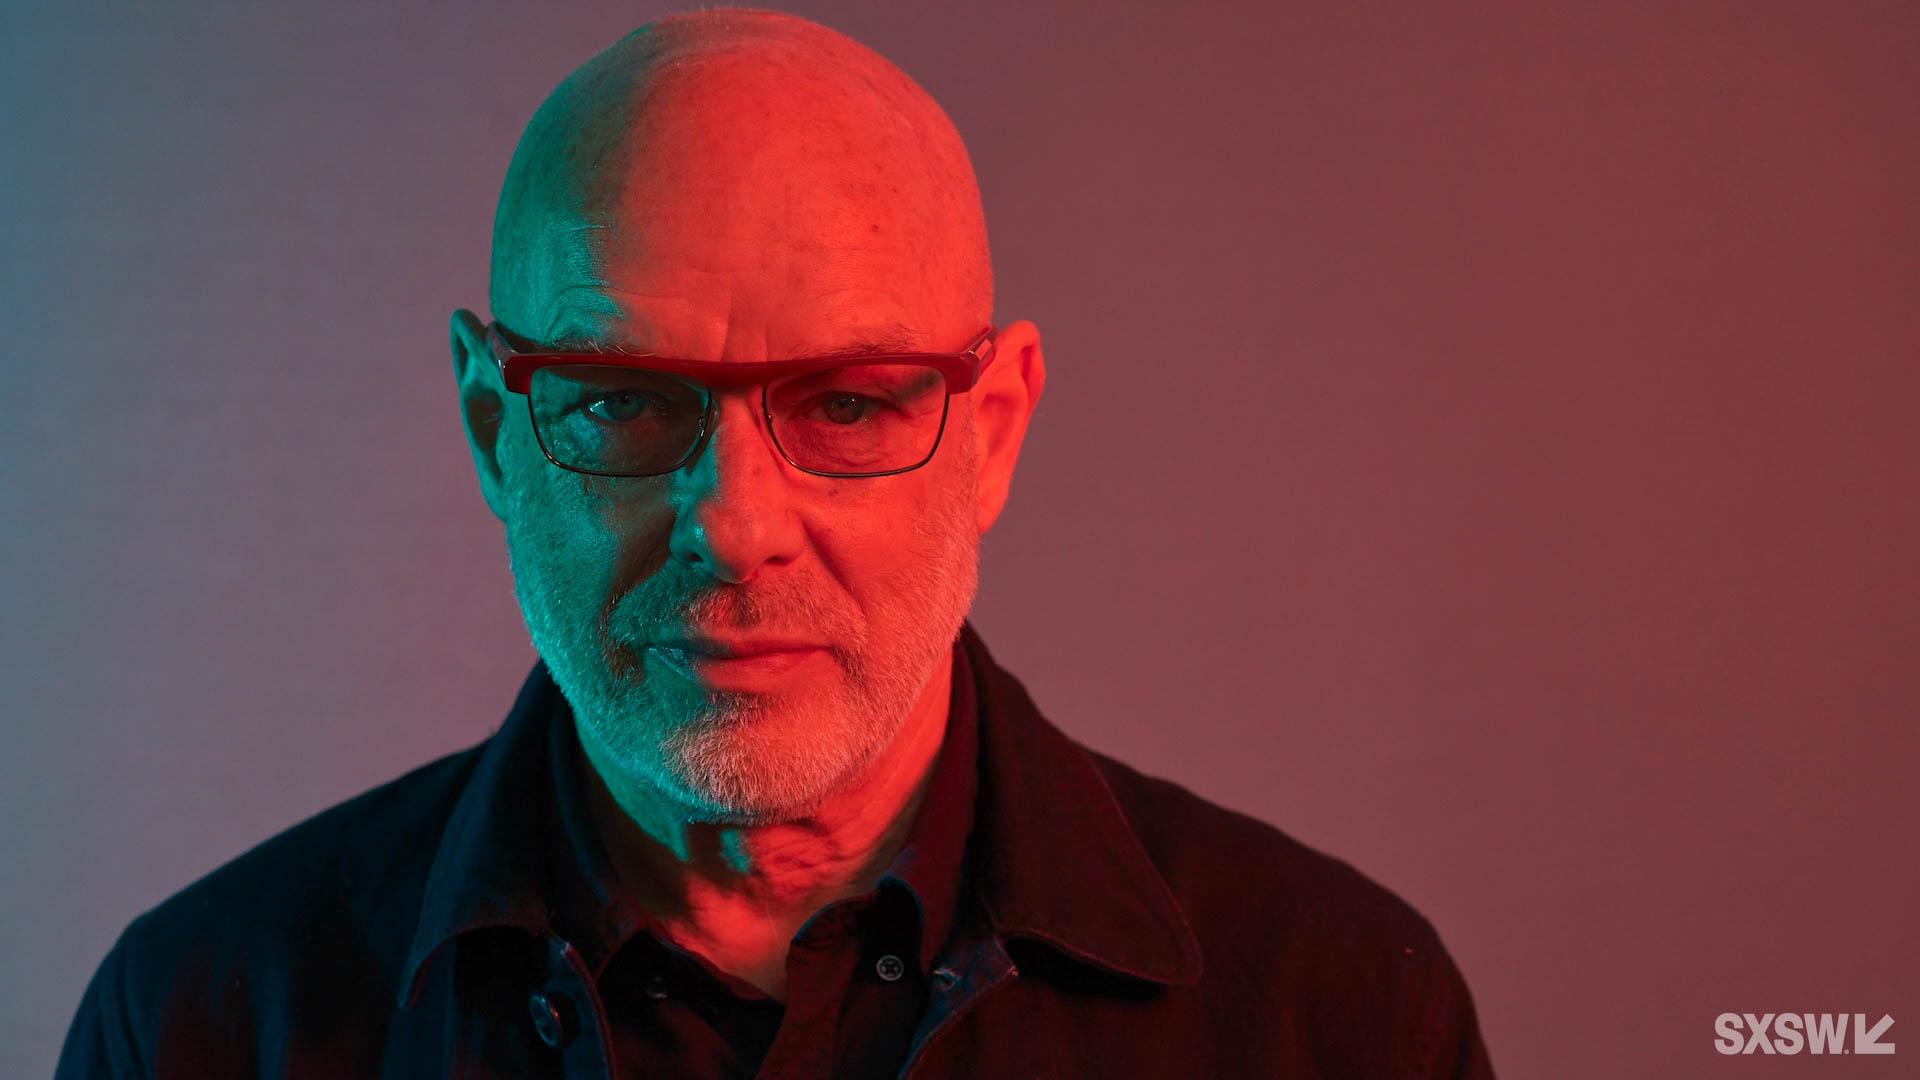 Brian Eno & Stewart Brand on Film, Music, and Creativity